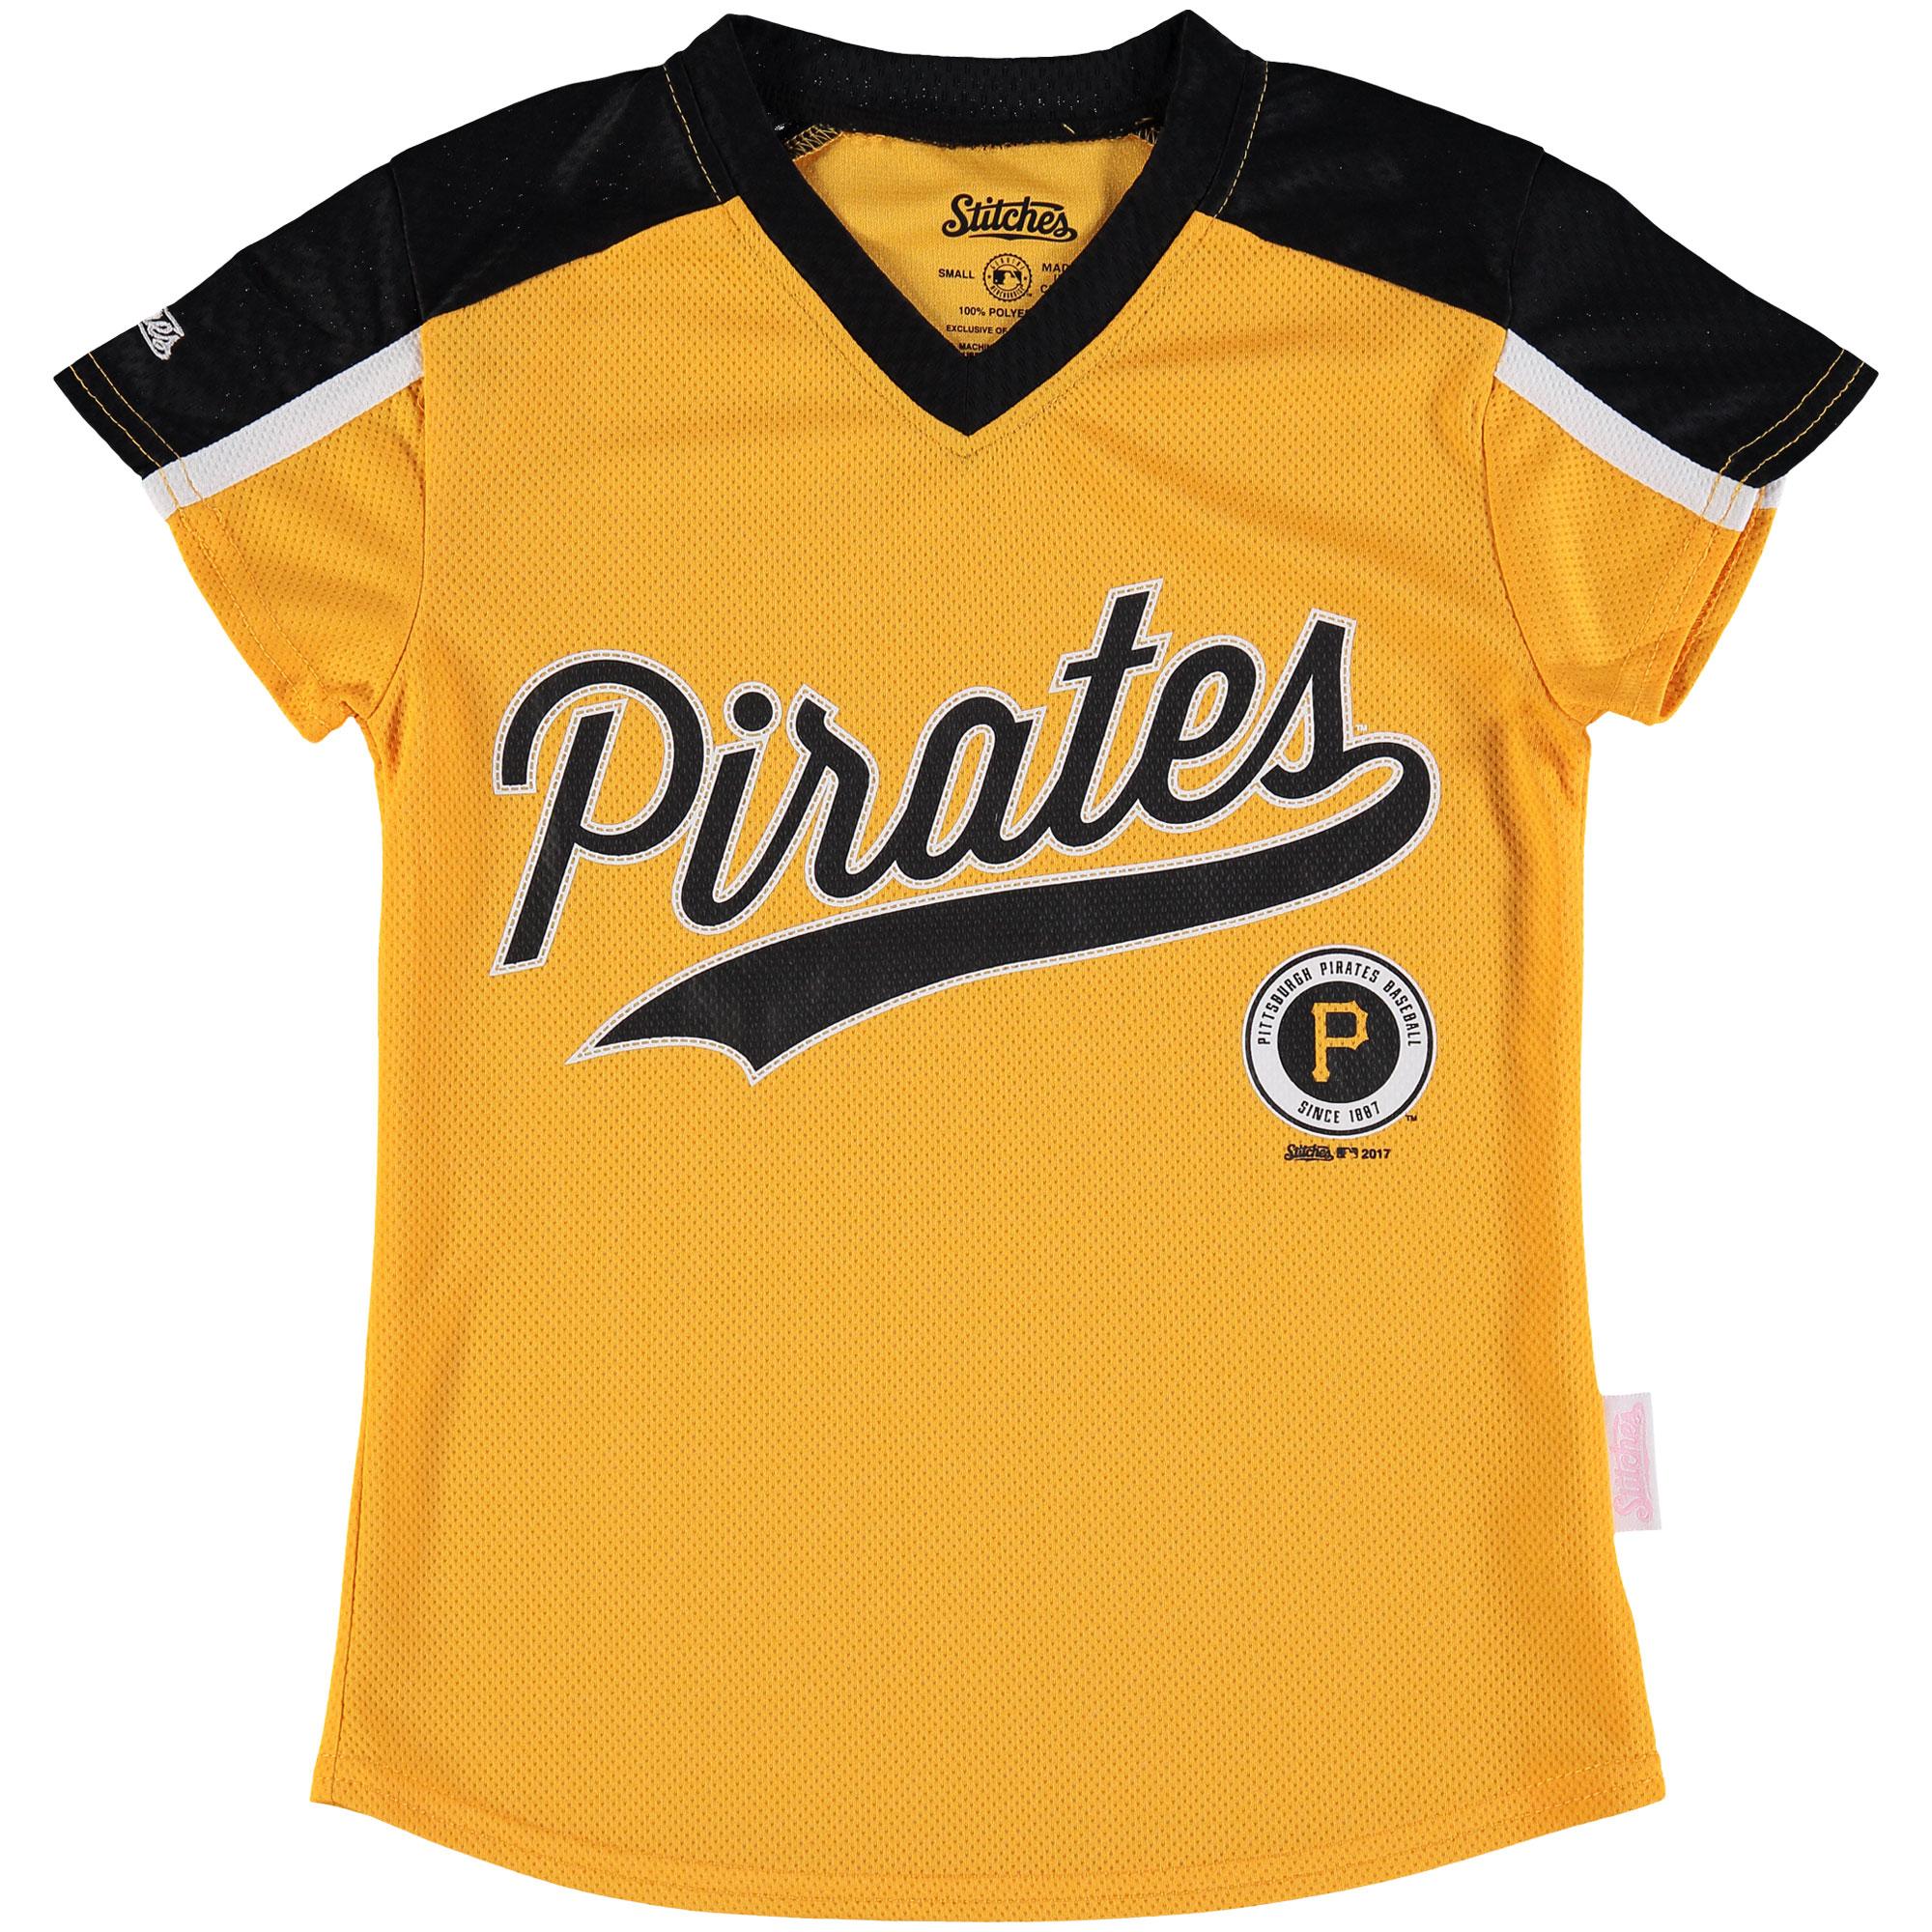 Pittsburgh Pirates Stitches Girls Youth V-Neck Jersey T-Shirt - Gold/Black